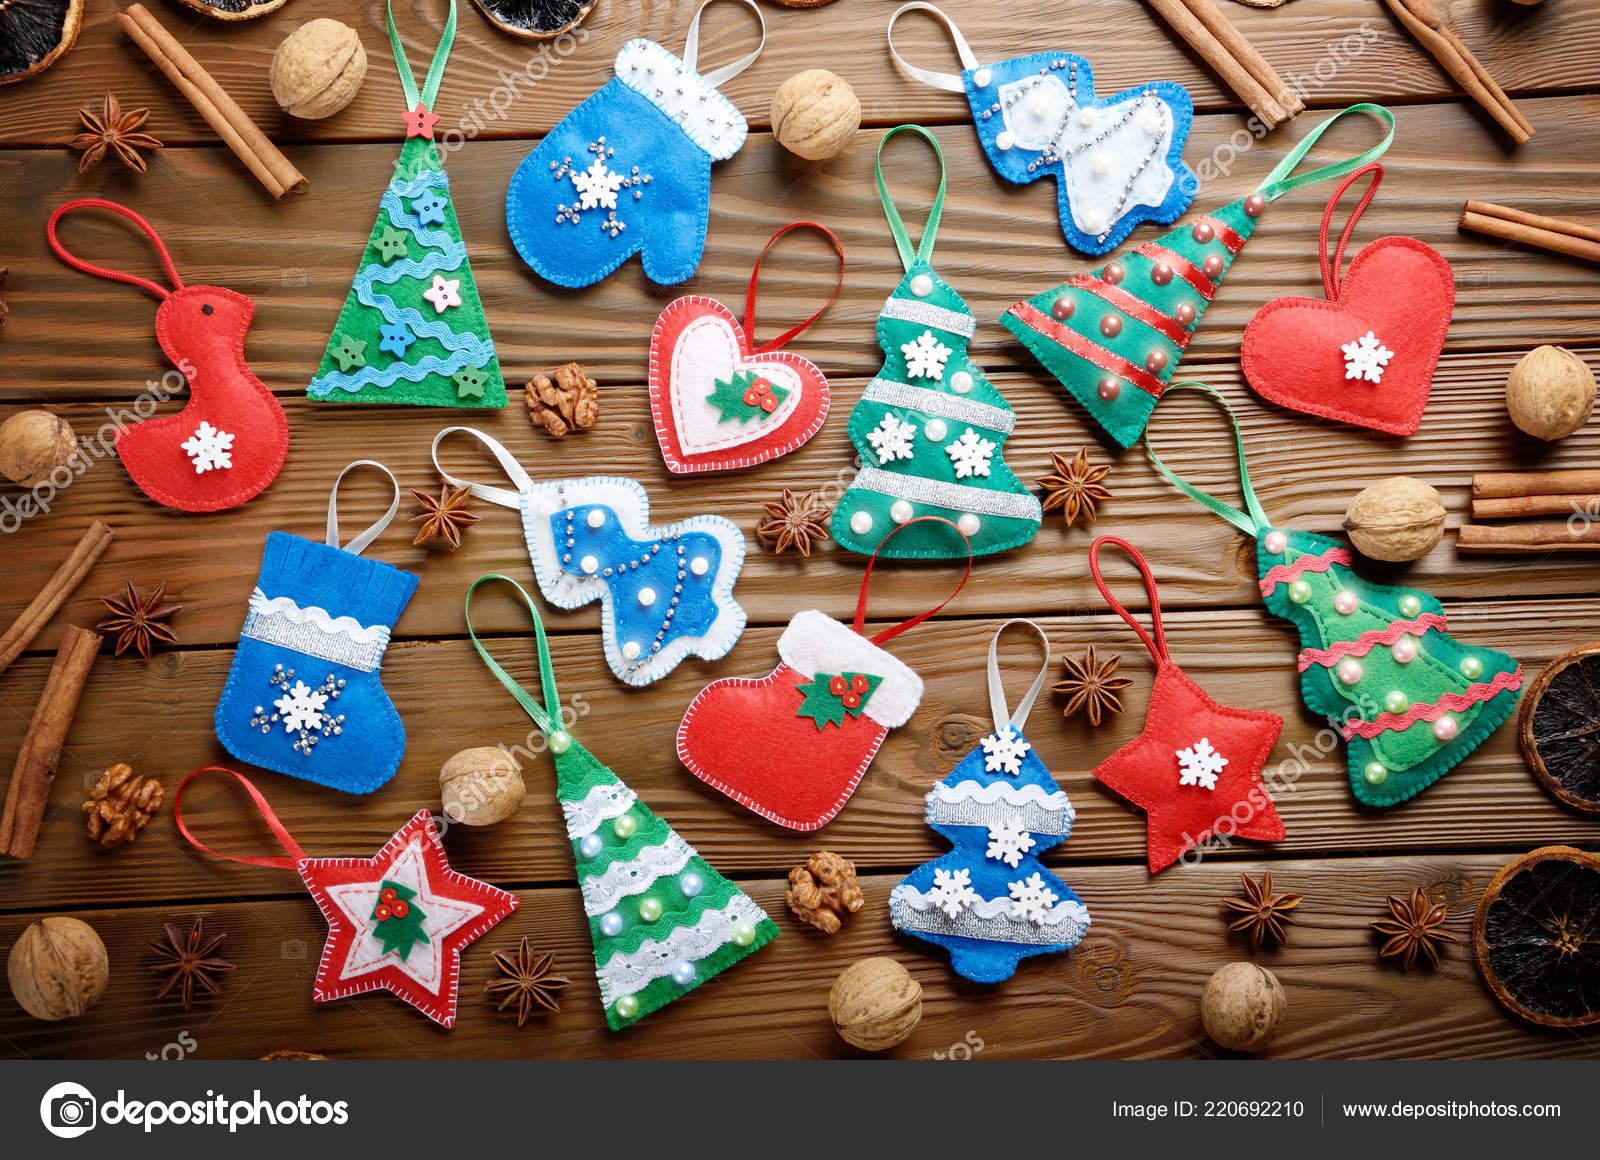 Assorted Handmade Rustic Felt Christmas Tree Decorations Anise Cinnamon Walnuts Stock Photo C E Mikh 220692210